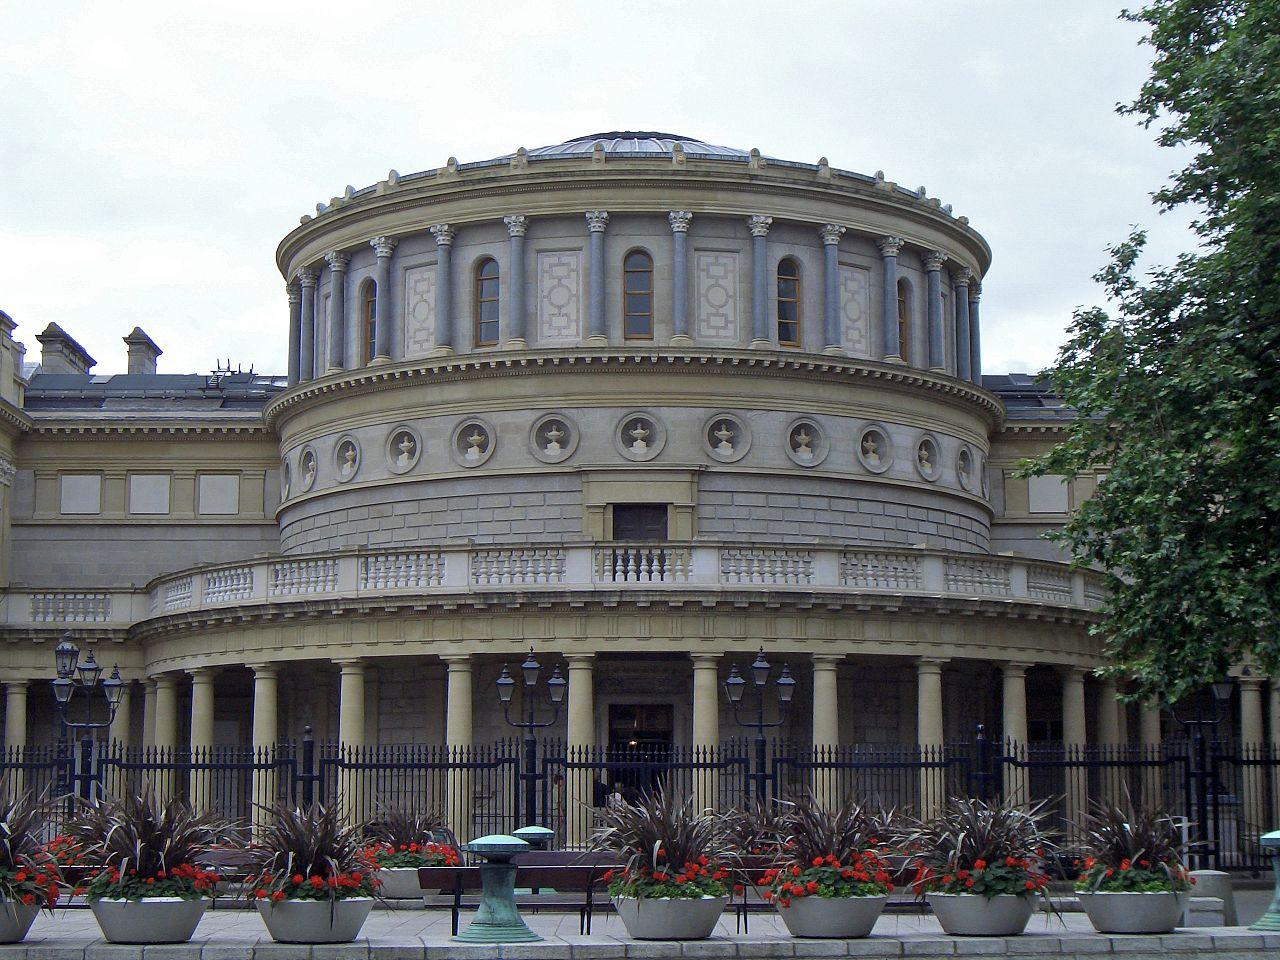 Museu Nacional da Irlanda